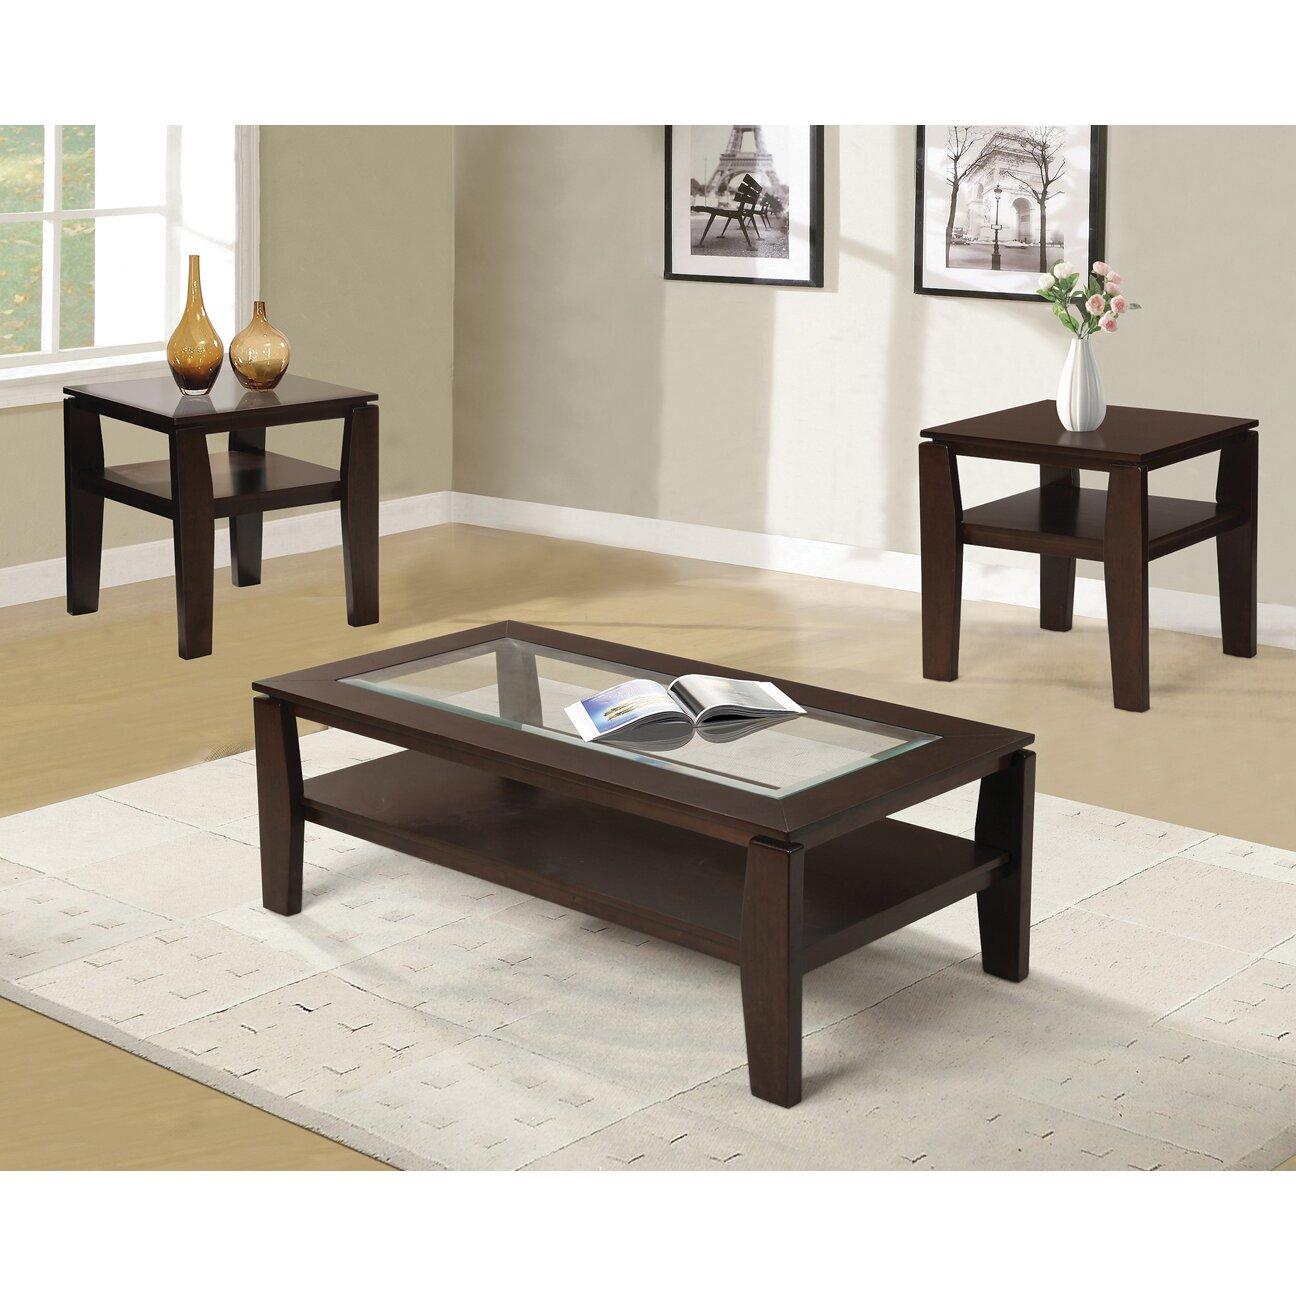 Three Piece Living Room Table Set Red Barrel Studio Golder 3 Piece Coffee Table Set Reviews Wayfair